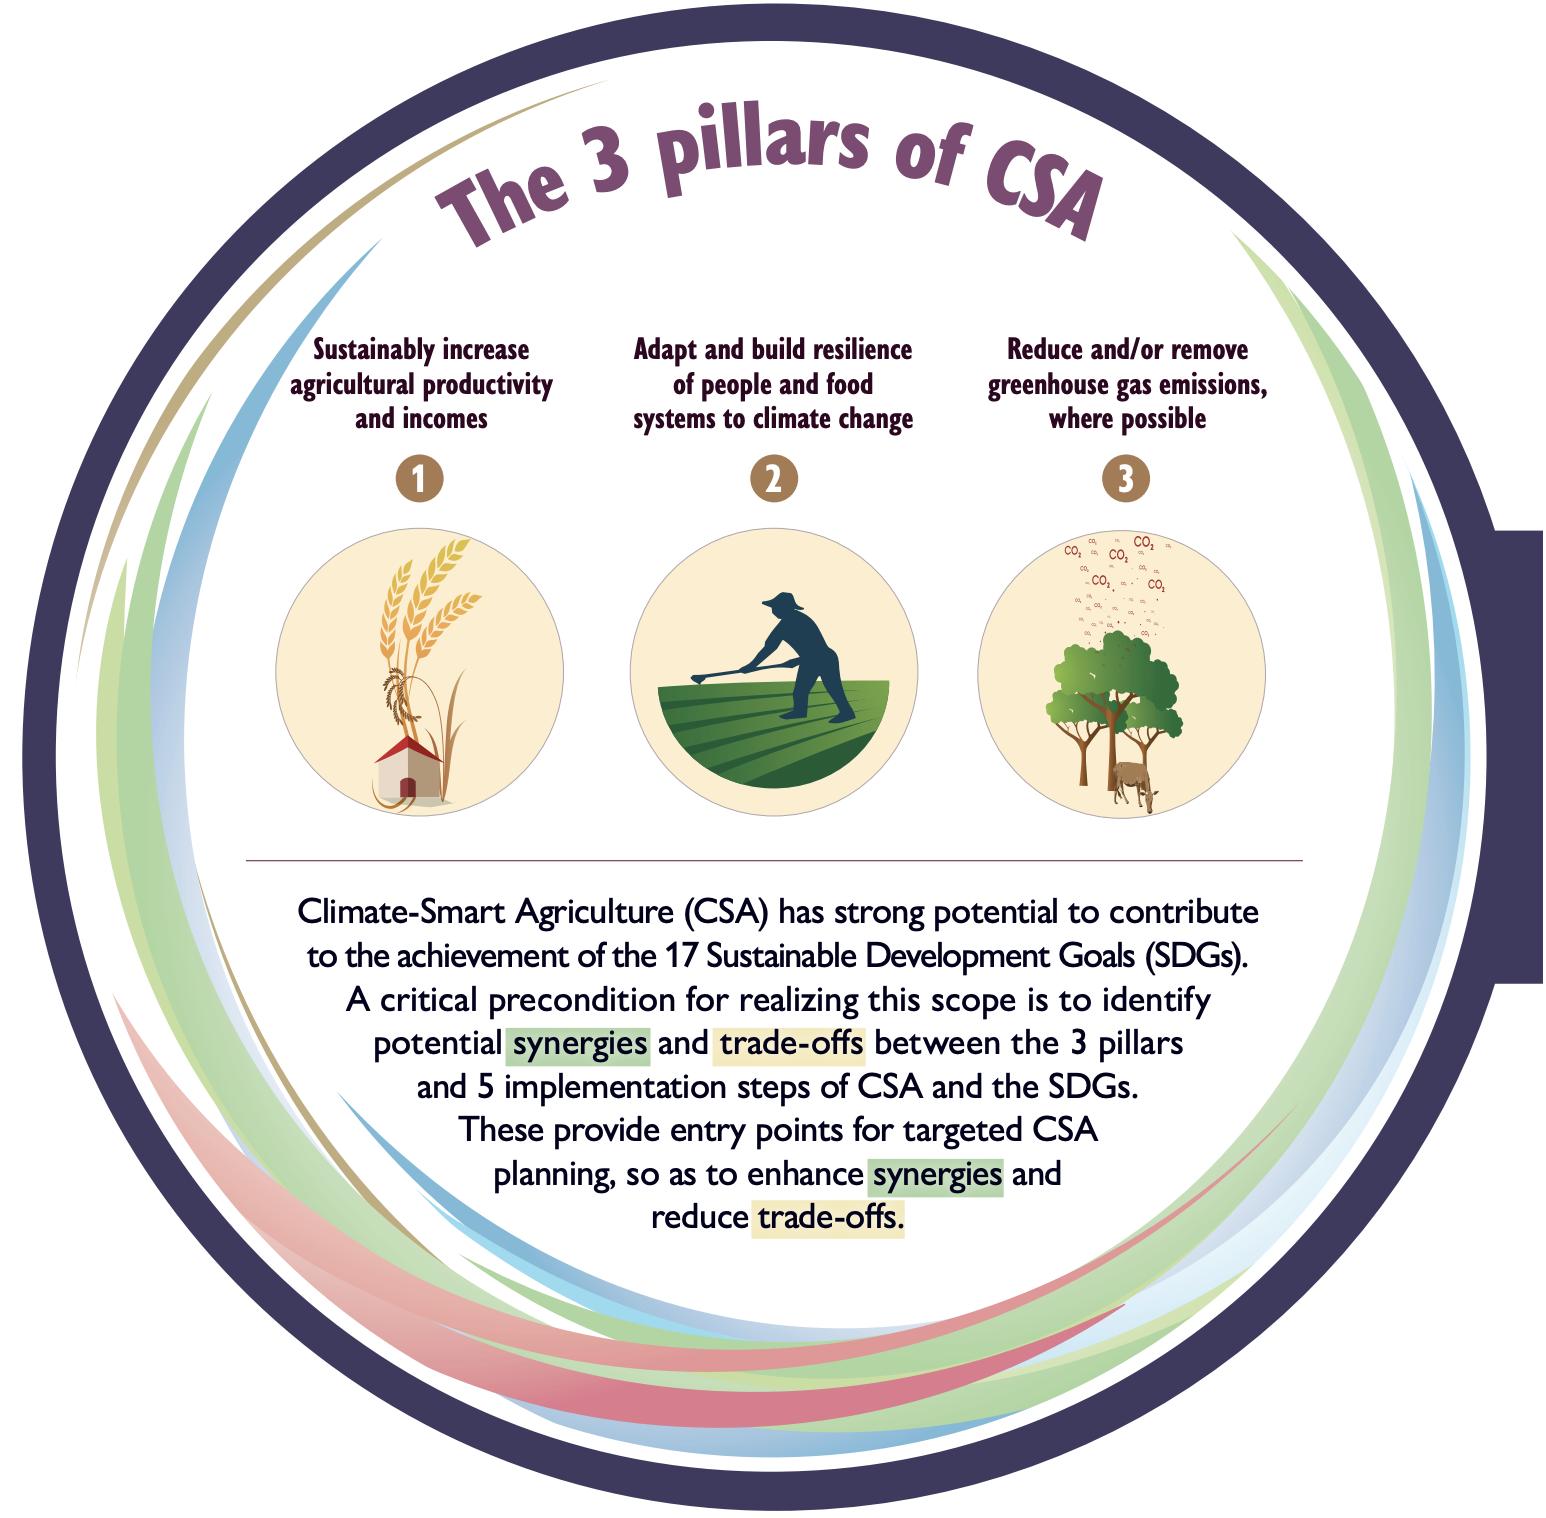 The 3 pillars of CSA